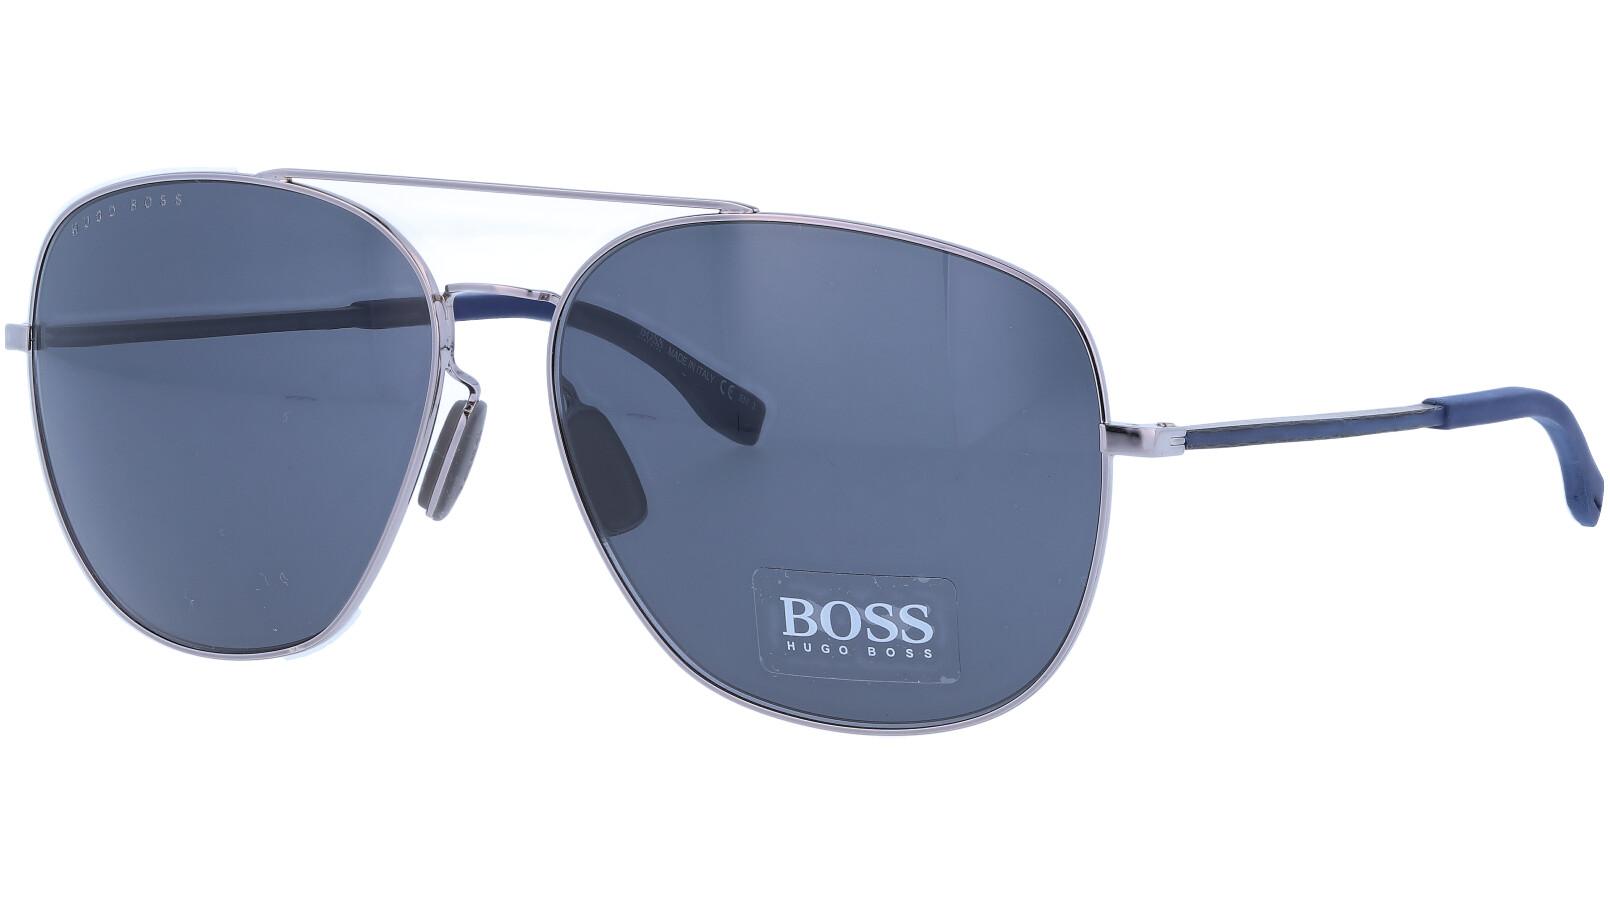 HUGO BOSS BOSS1032FS 003M9 62 MATT Sunglasses